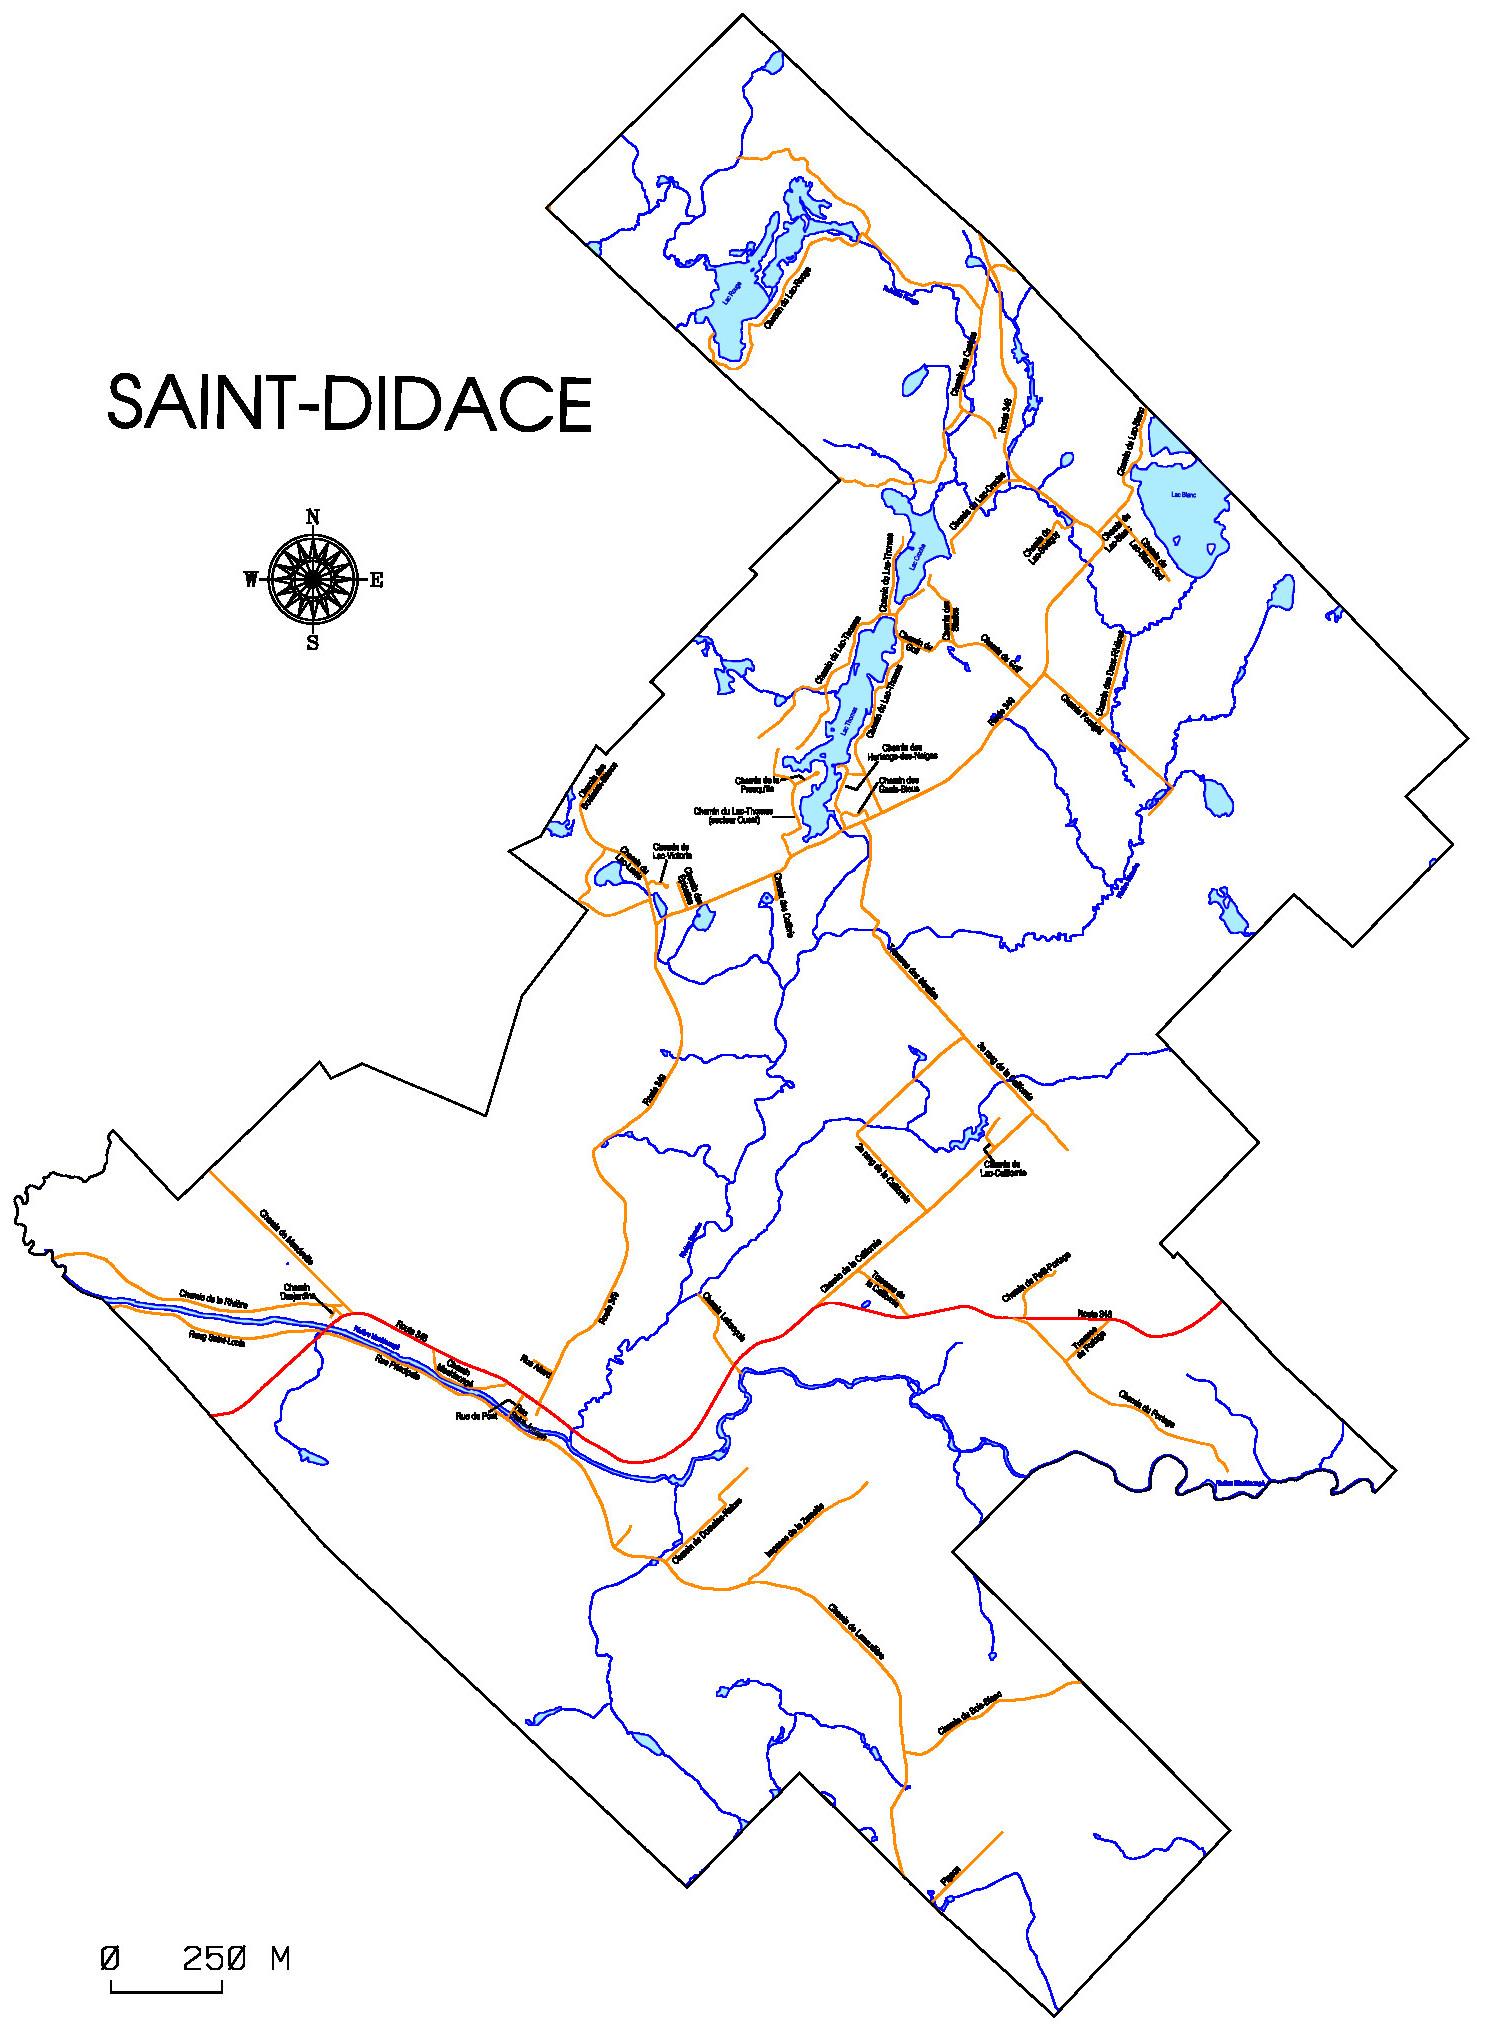 Carte de Saint-Didace.